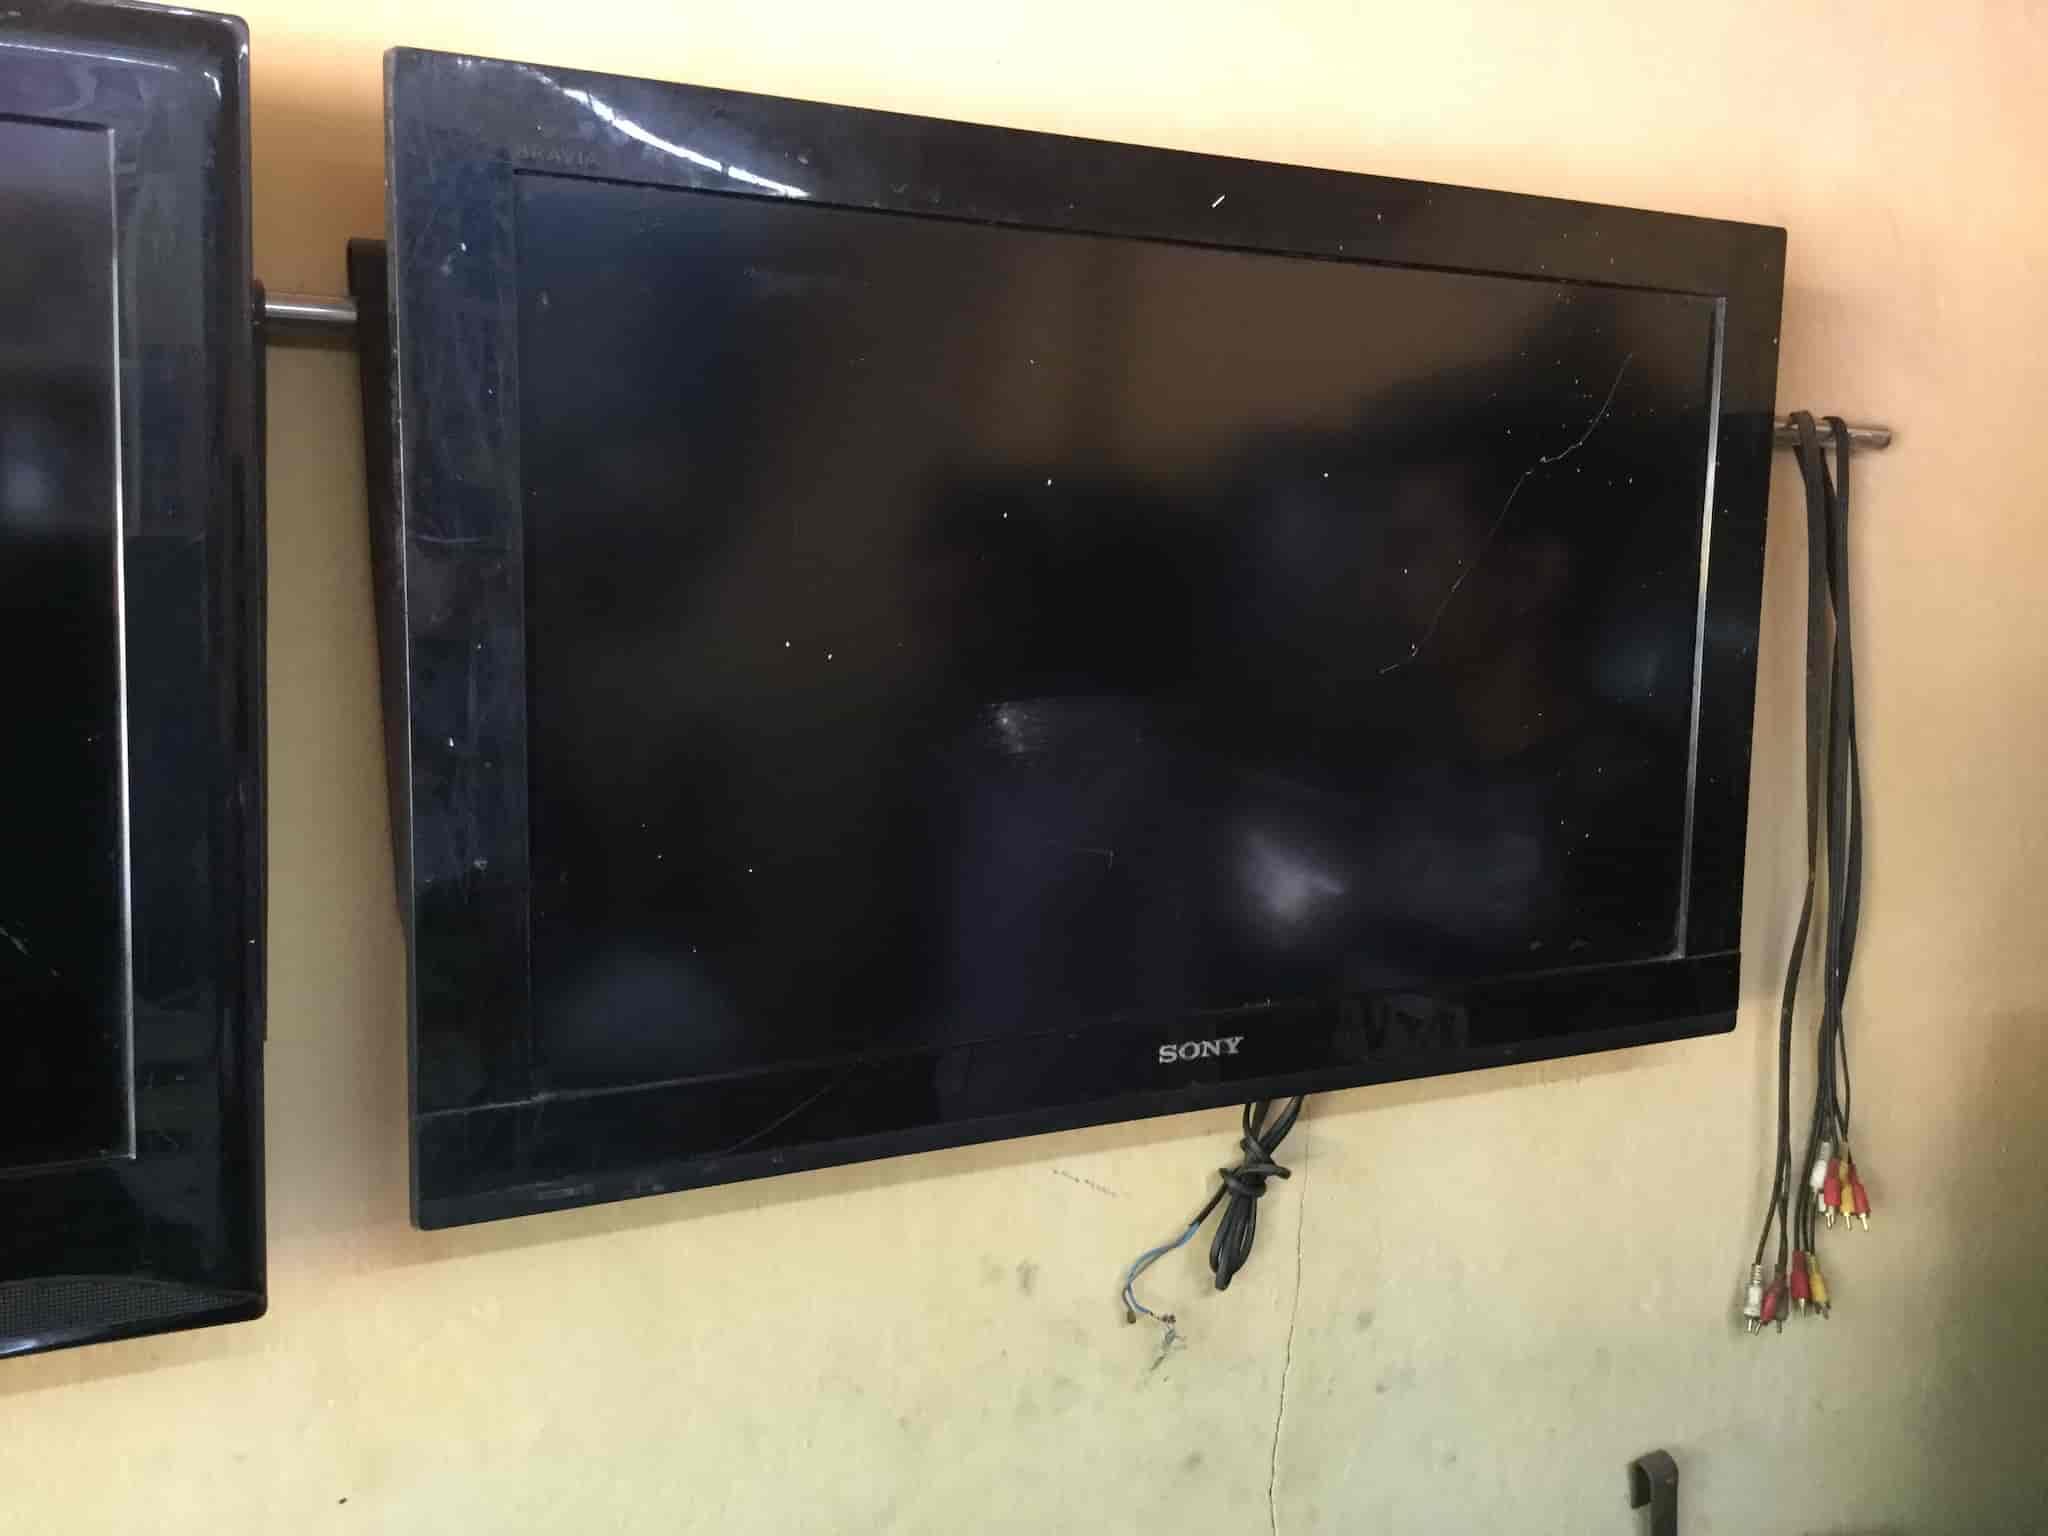 592323bb9 Om Sai Kripa Electronics, Sadar Bazar - TV Repair & Services in Indore -  Justdial